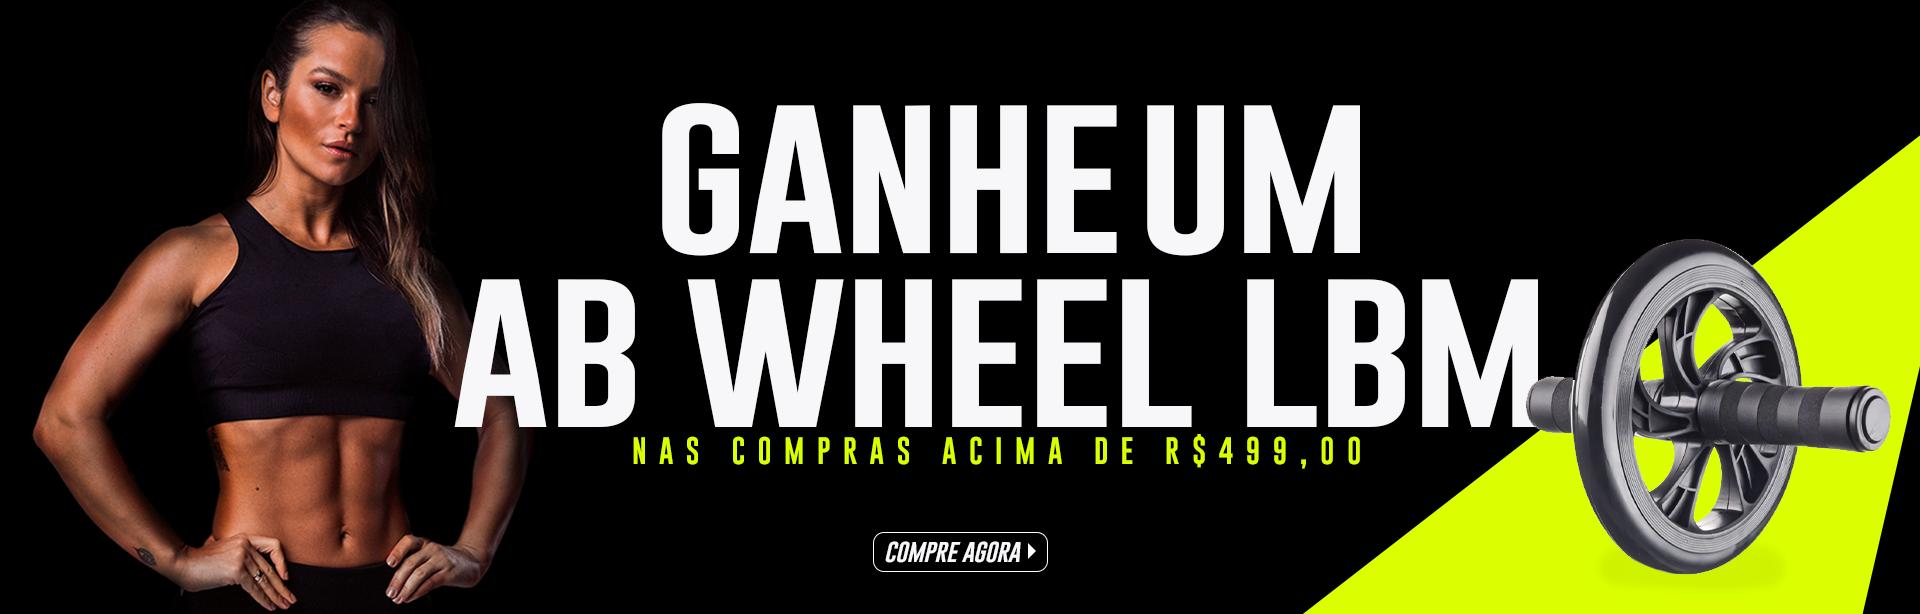 Canha Whell